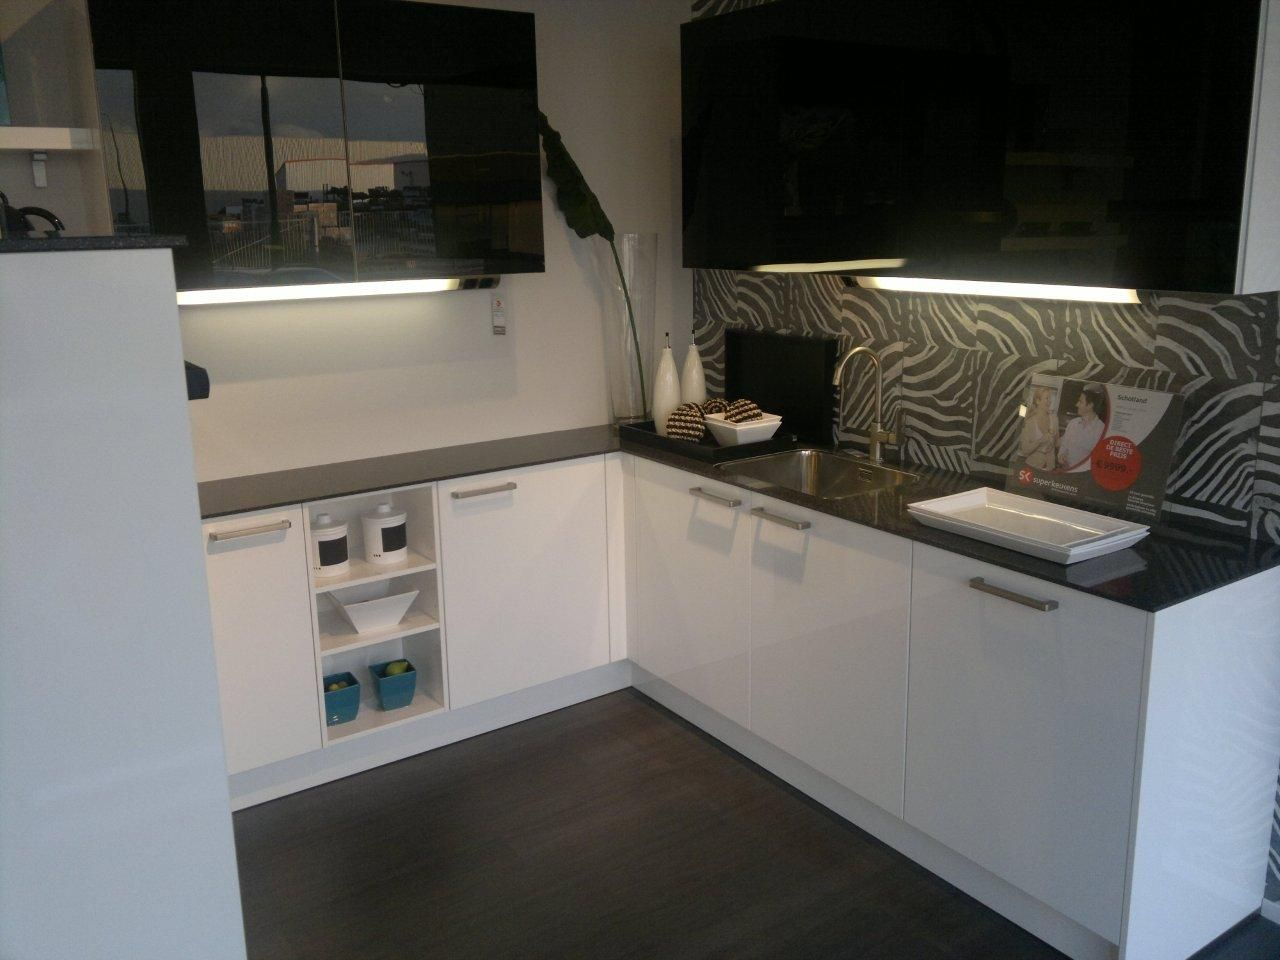 Allergrootste keukensite van nederland moderne hoogglans keuken 45021 - Model keuken wit gelakt ...